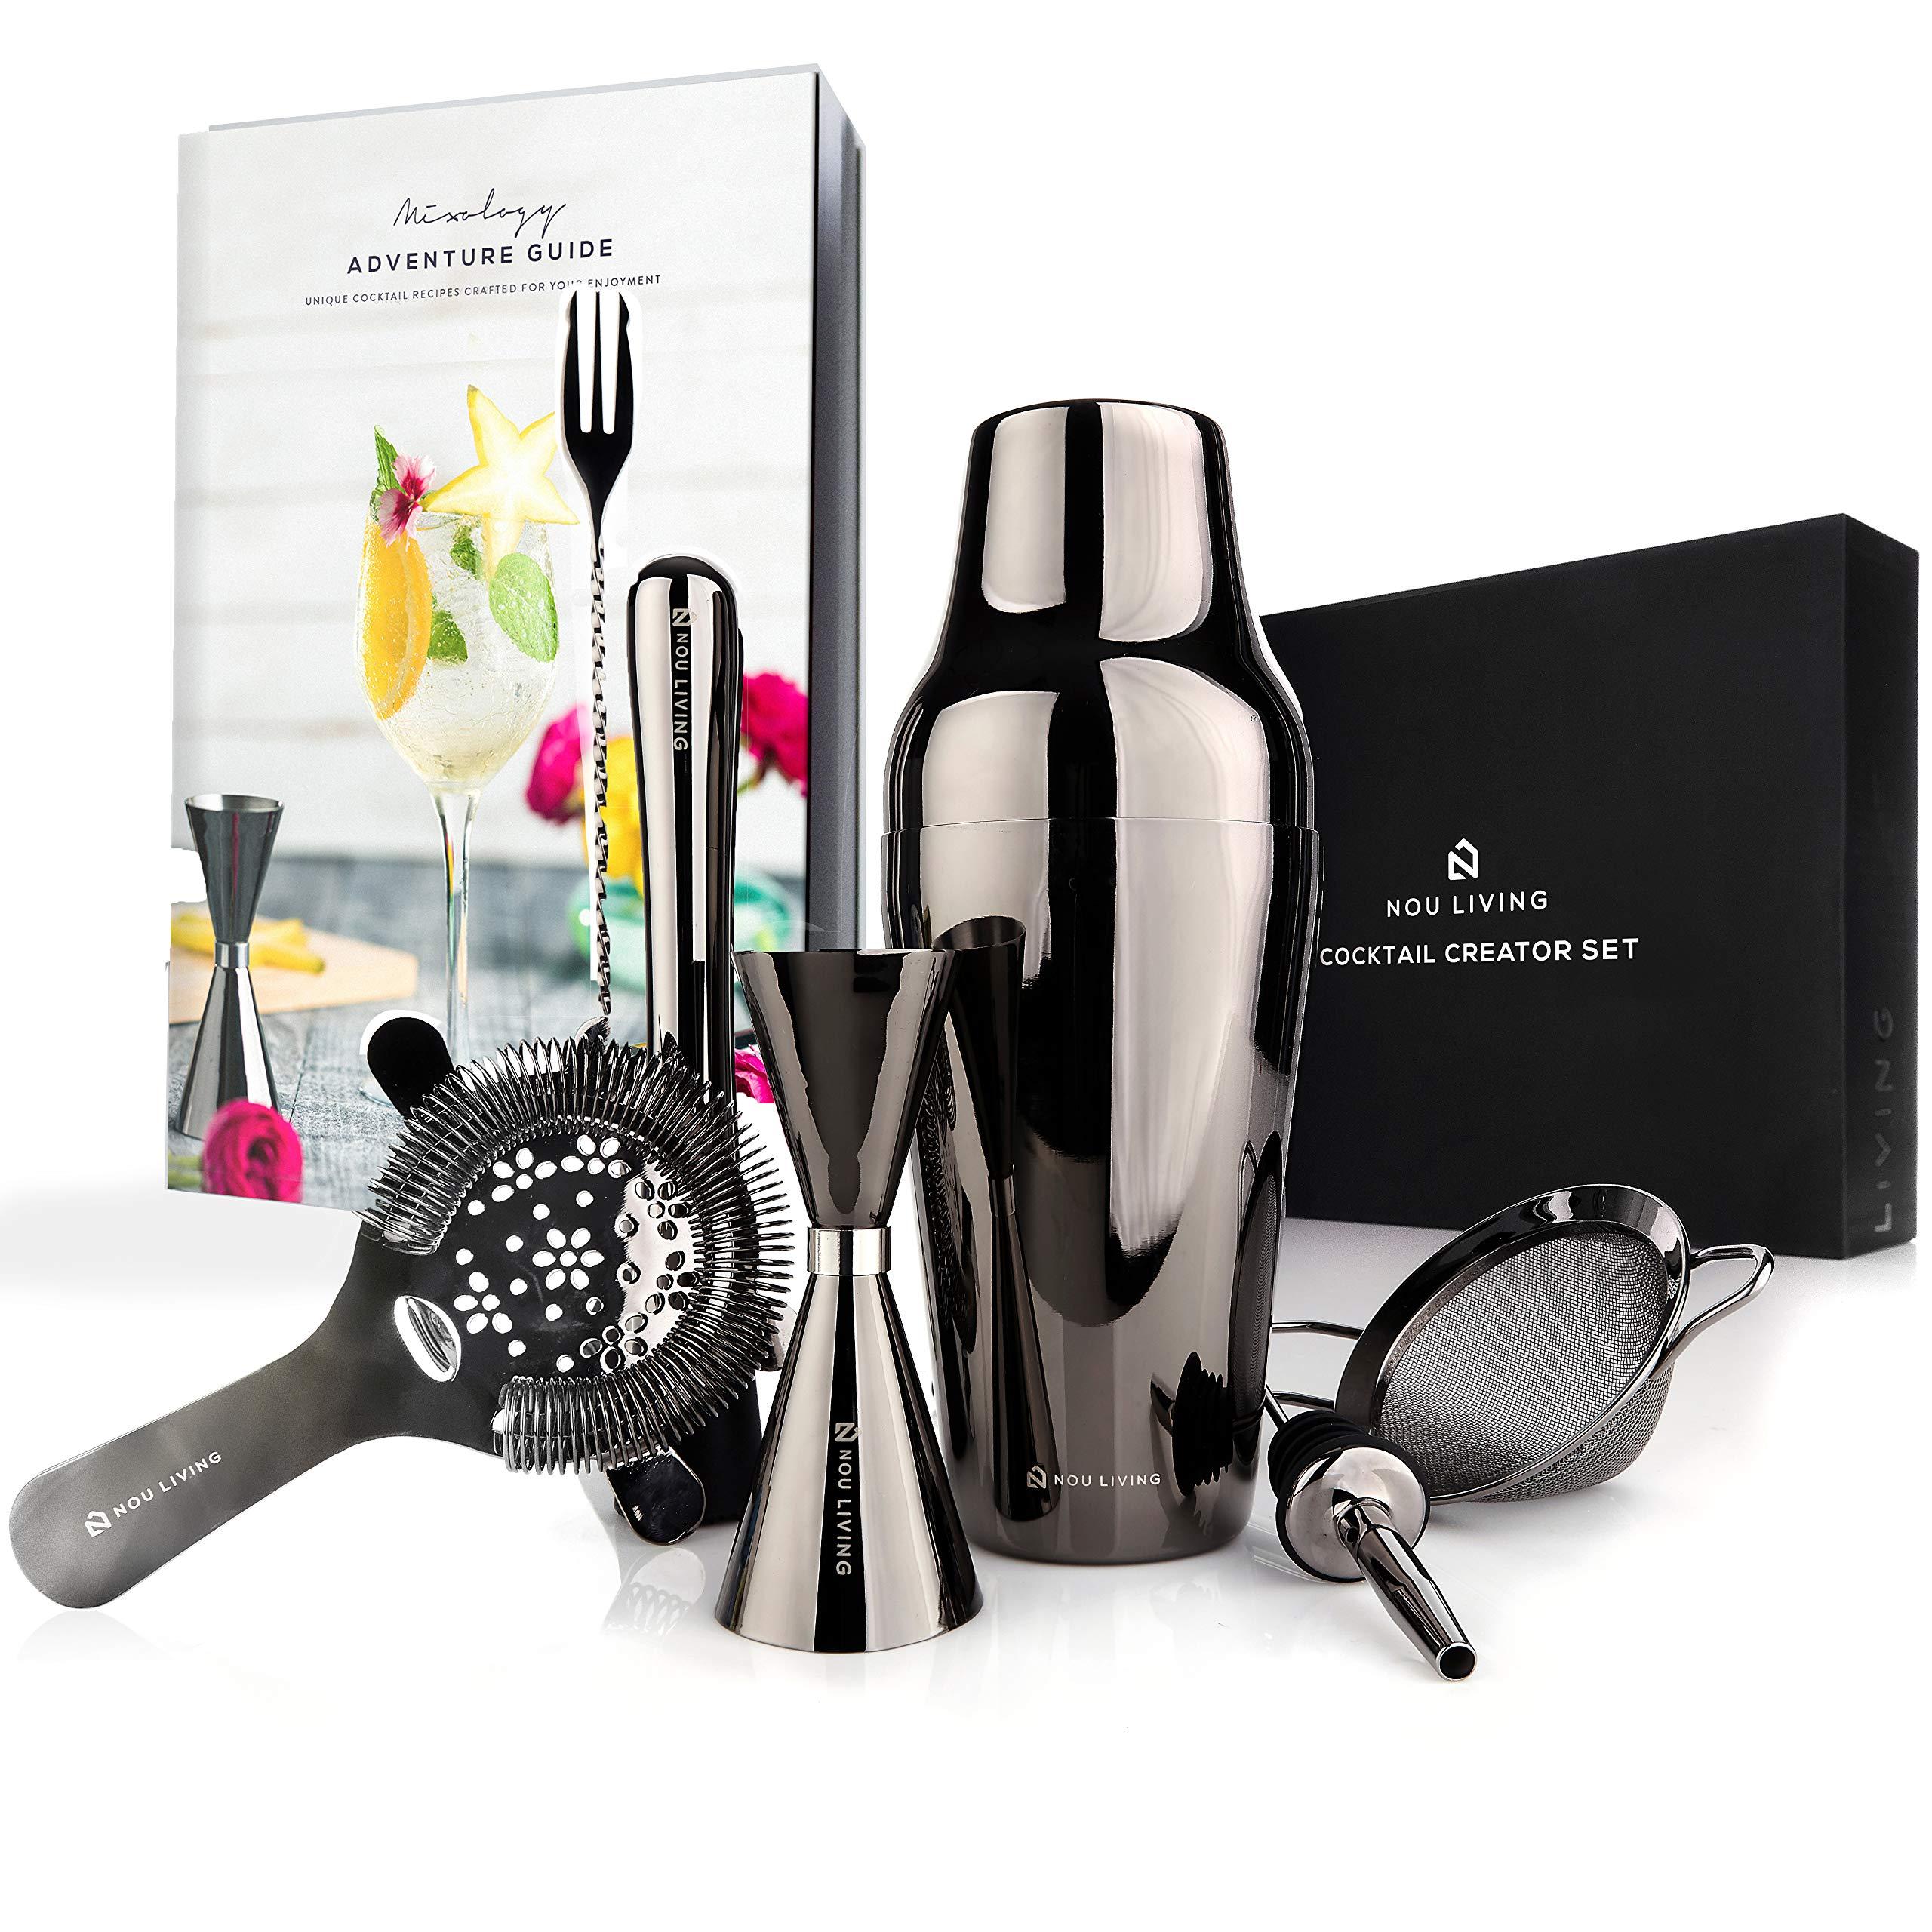 Premium Cocktail Shaker Set and Mixology Bartender Kit - Luxury Bar Set & Bartending Tools: Parisian Drink Shaker, Strainer, Muddler, Jigger, Mixer Spoon, Accessories & Recipe E-Book - Gun Metal Black by Nou Living (Image #1)